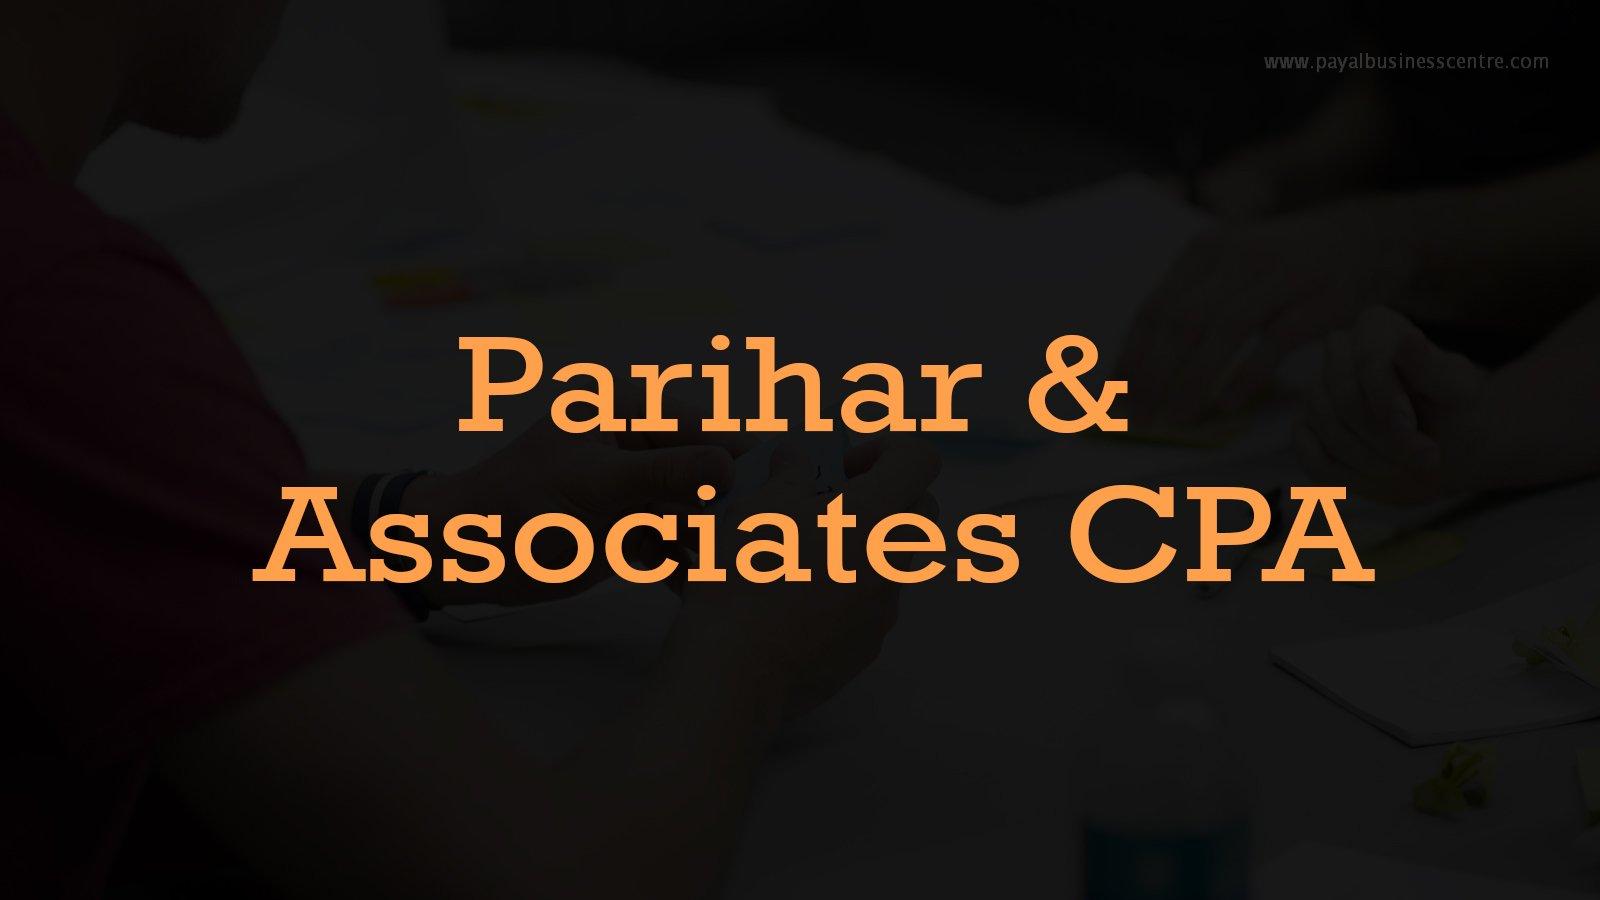 Parihar & Associates CPA